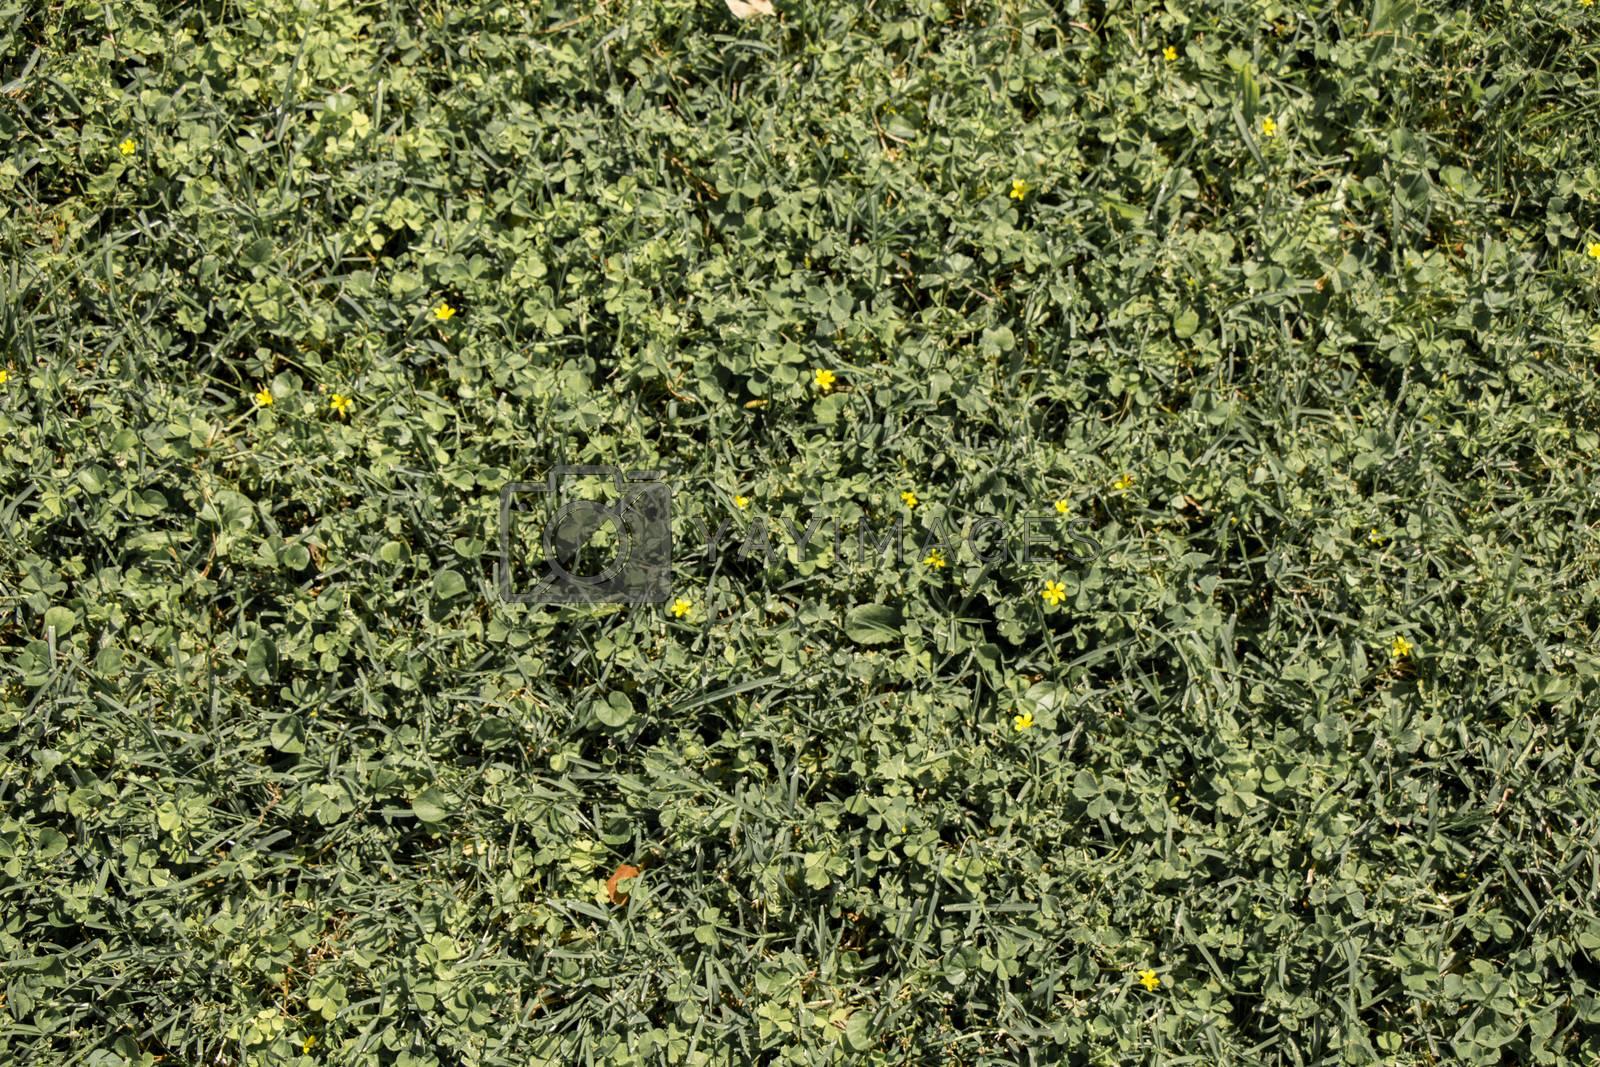 Green grass as green background by berkay